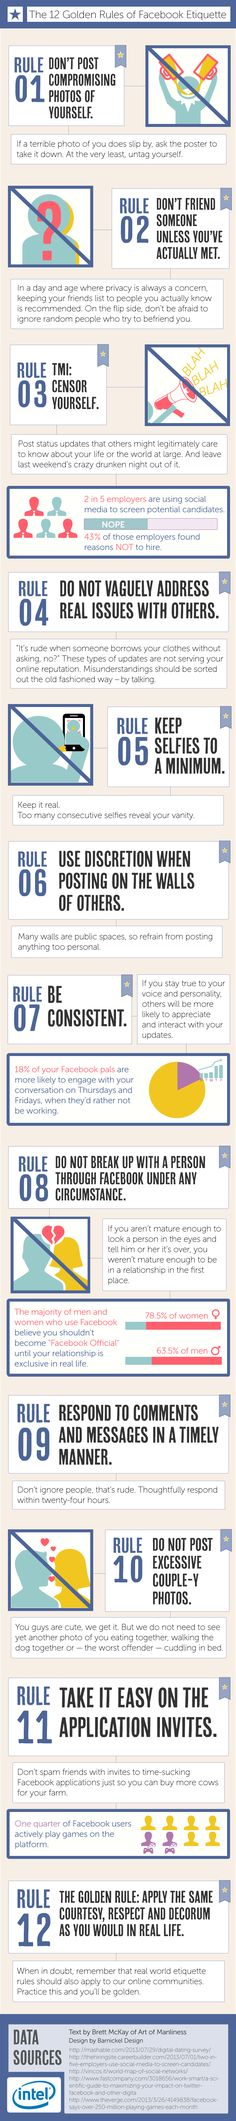 12 reglas de oro de la etiqueta en FaceBook #infografia #infographic #socialmedia